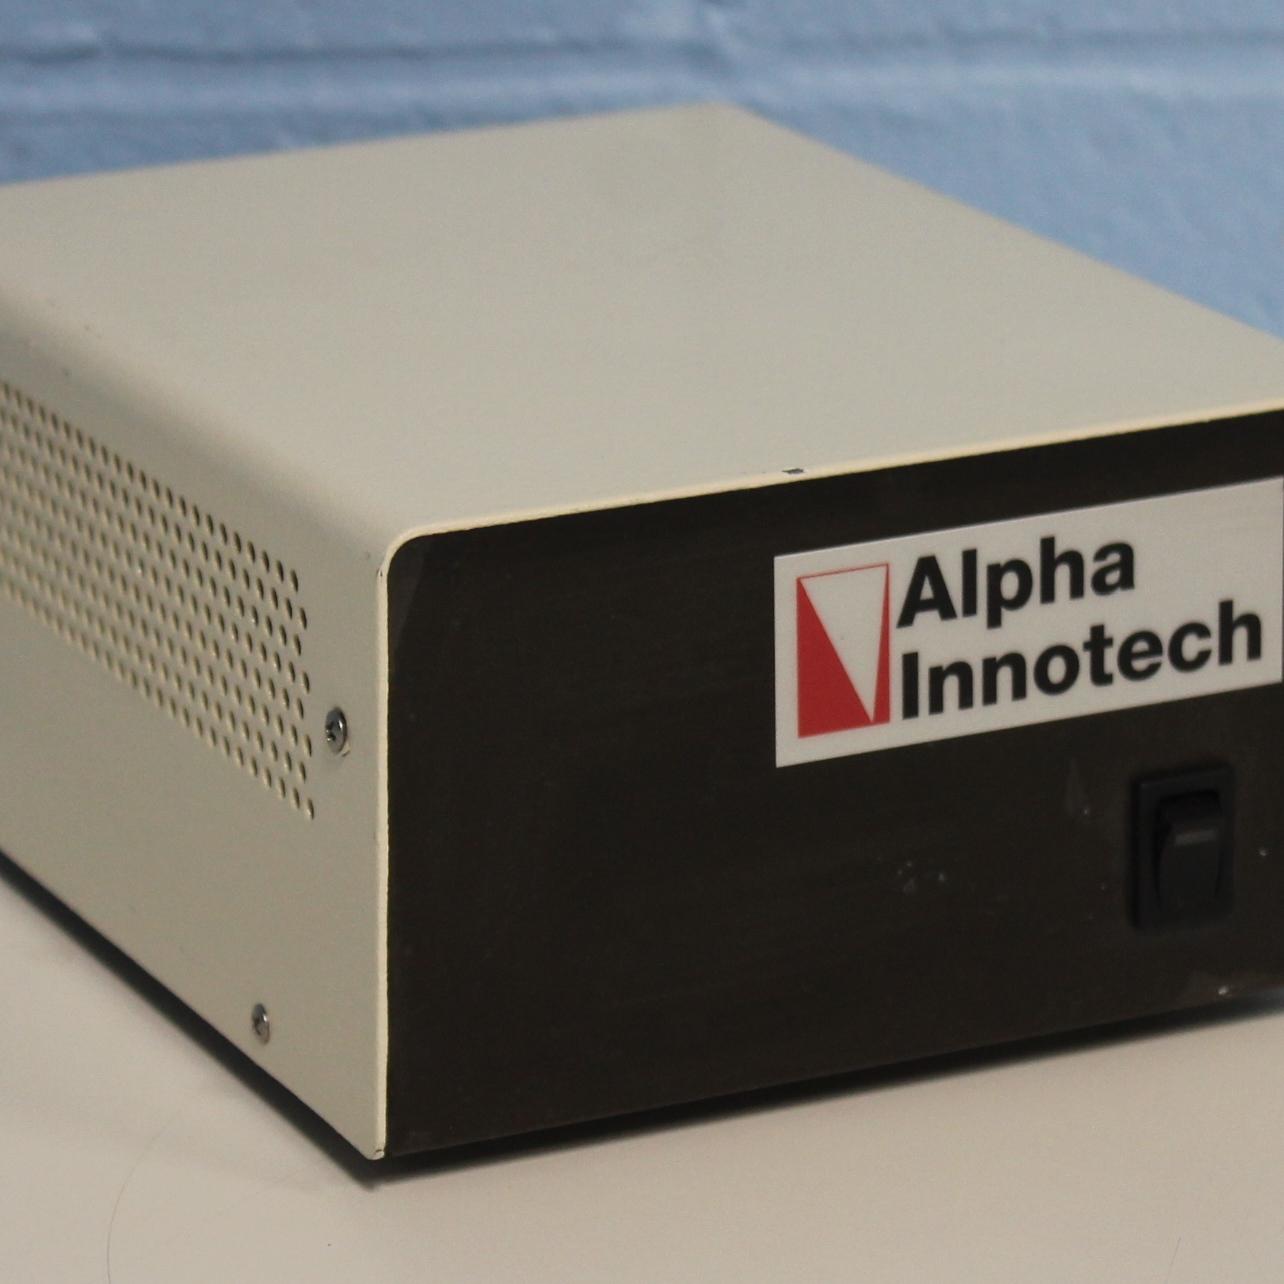 Alpha Innotech Model RT SE/KE PS Power supply for FluorChem system Image